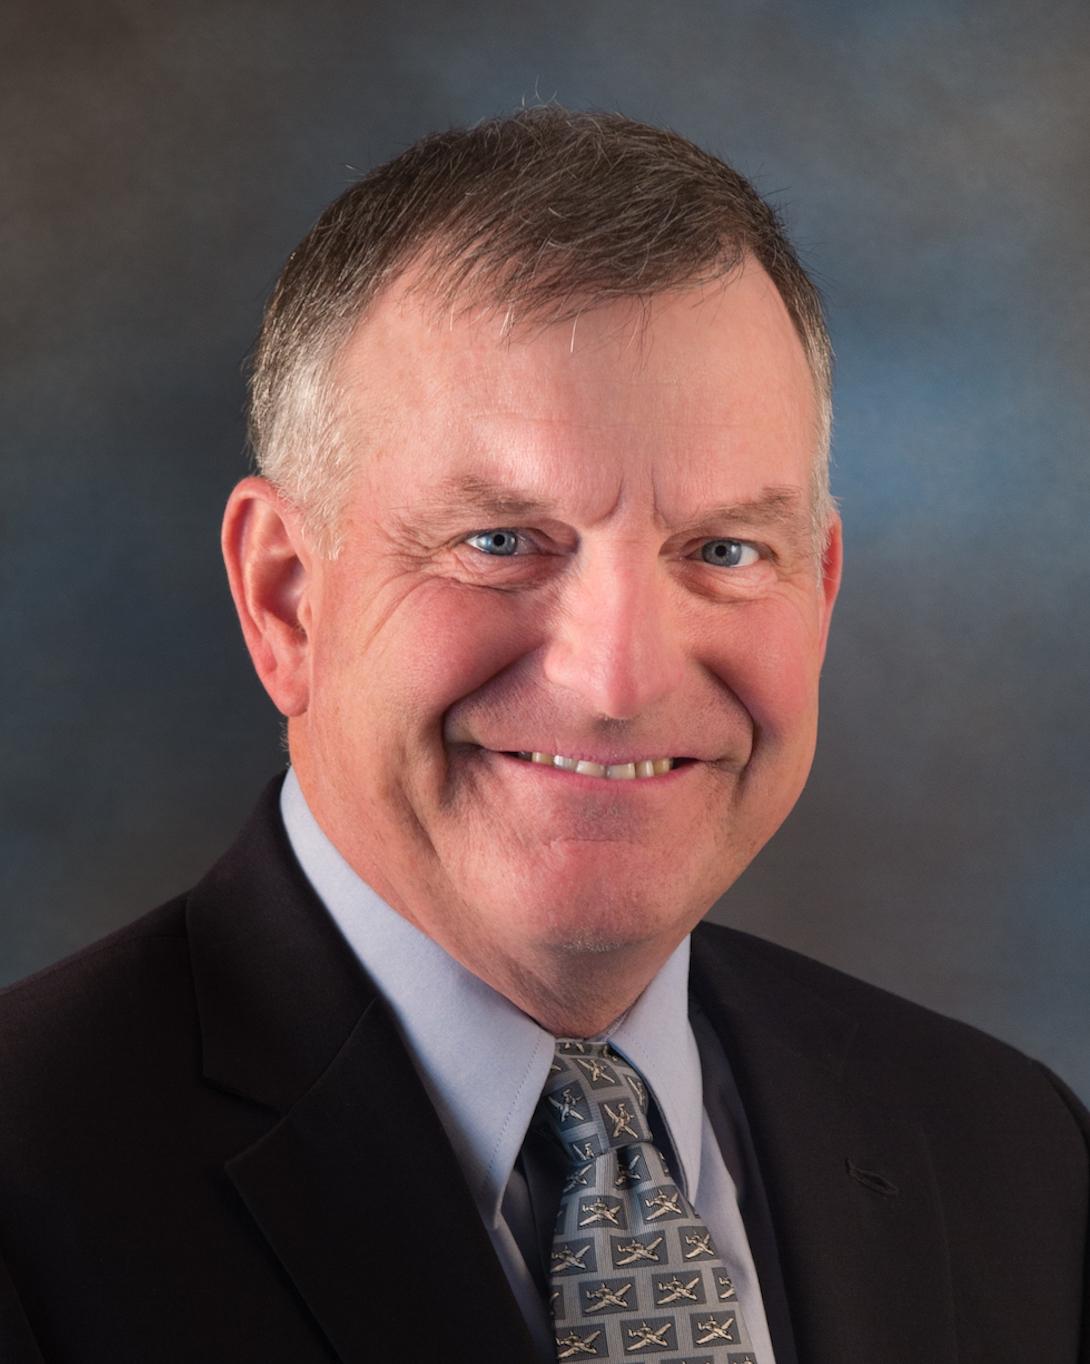 Major General Paul G. Schafer, USAF (retd ) | Aerospace